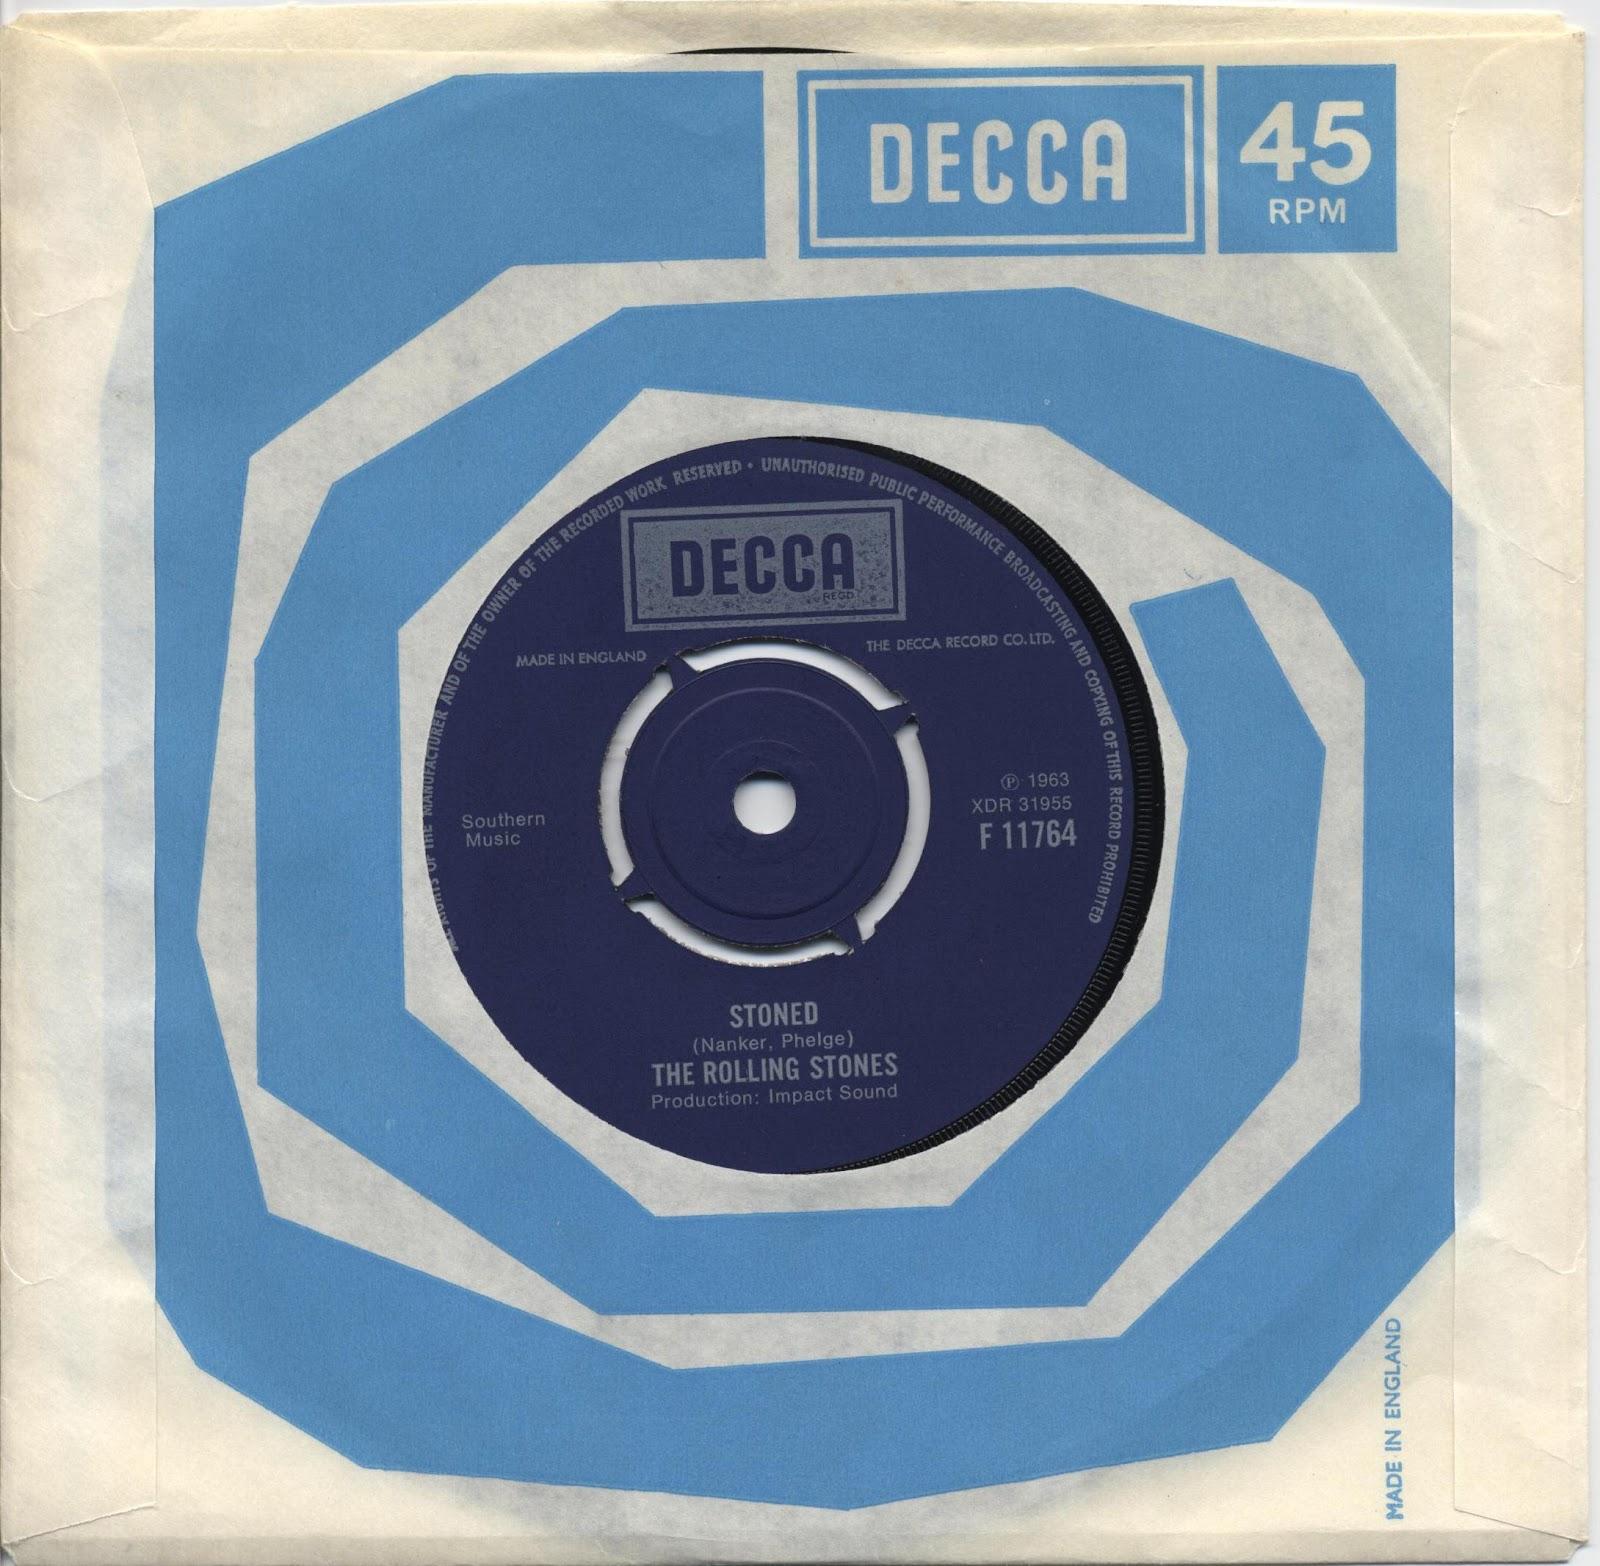 decca records label - softwaremonster info